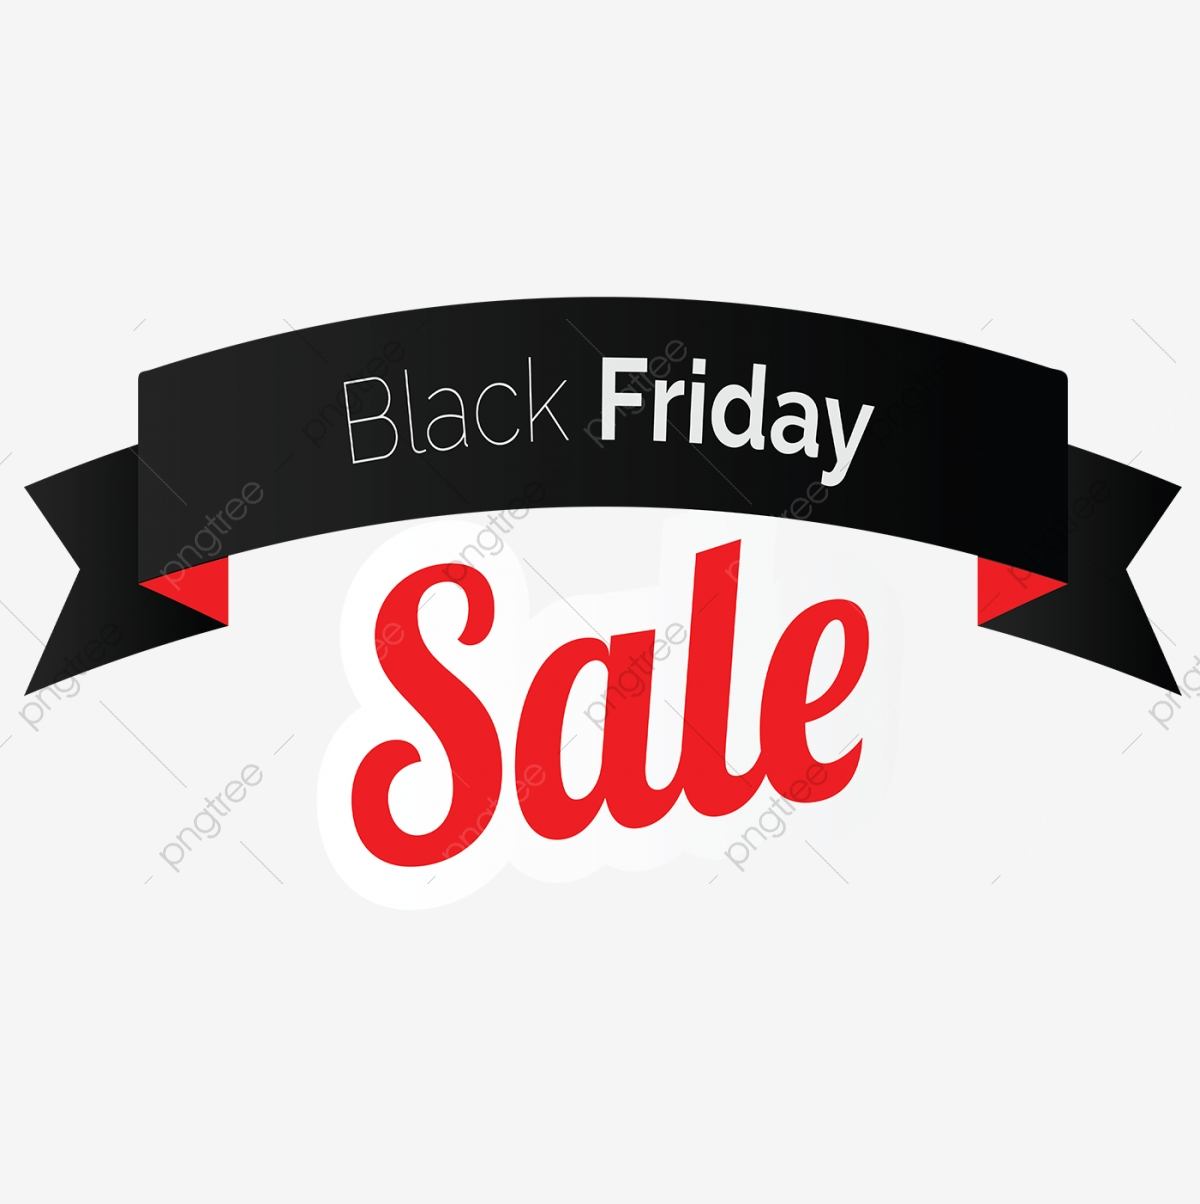 Black Friday Sale, Clipart, Black Friday, Sales PNG Transparent.